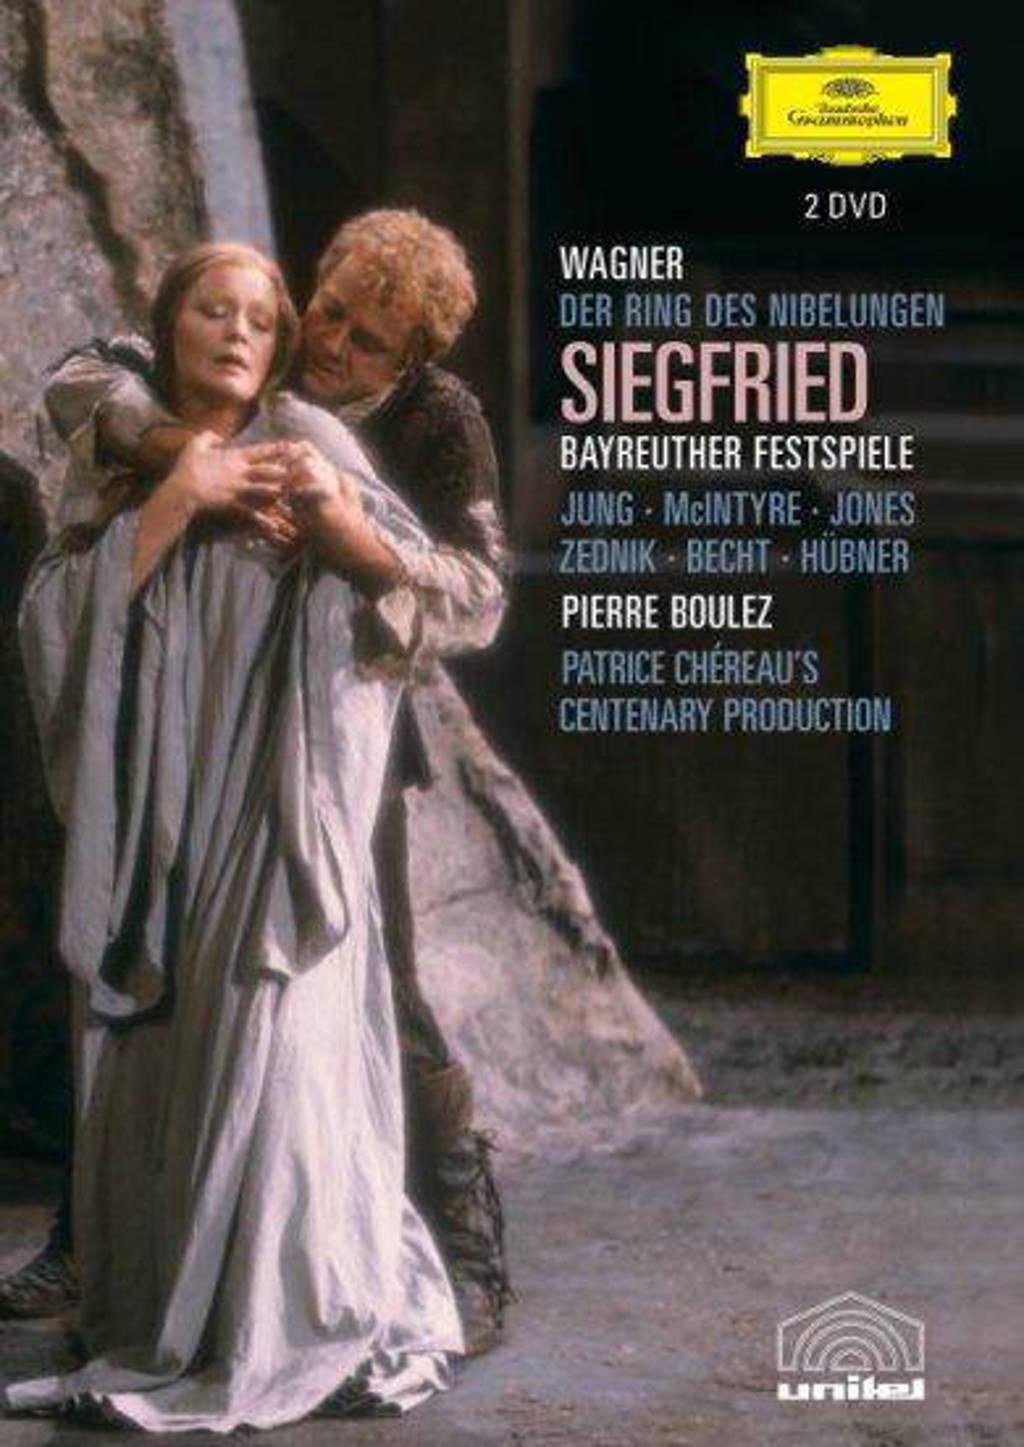 Wagner - Siegfried (DVD)